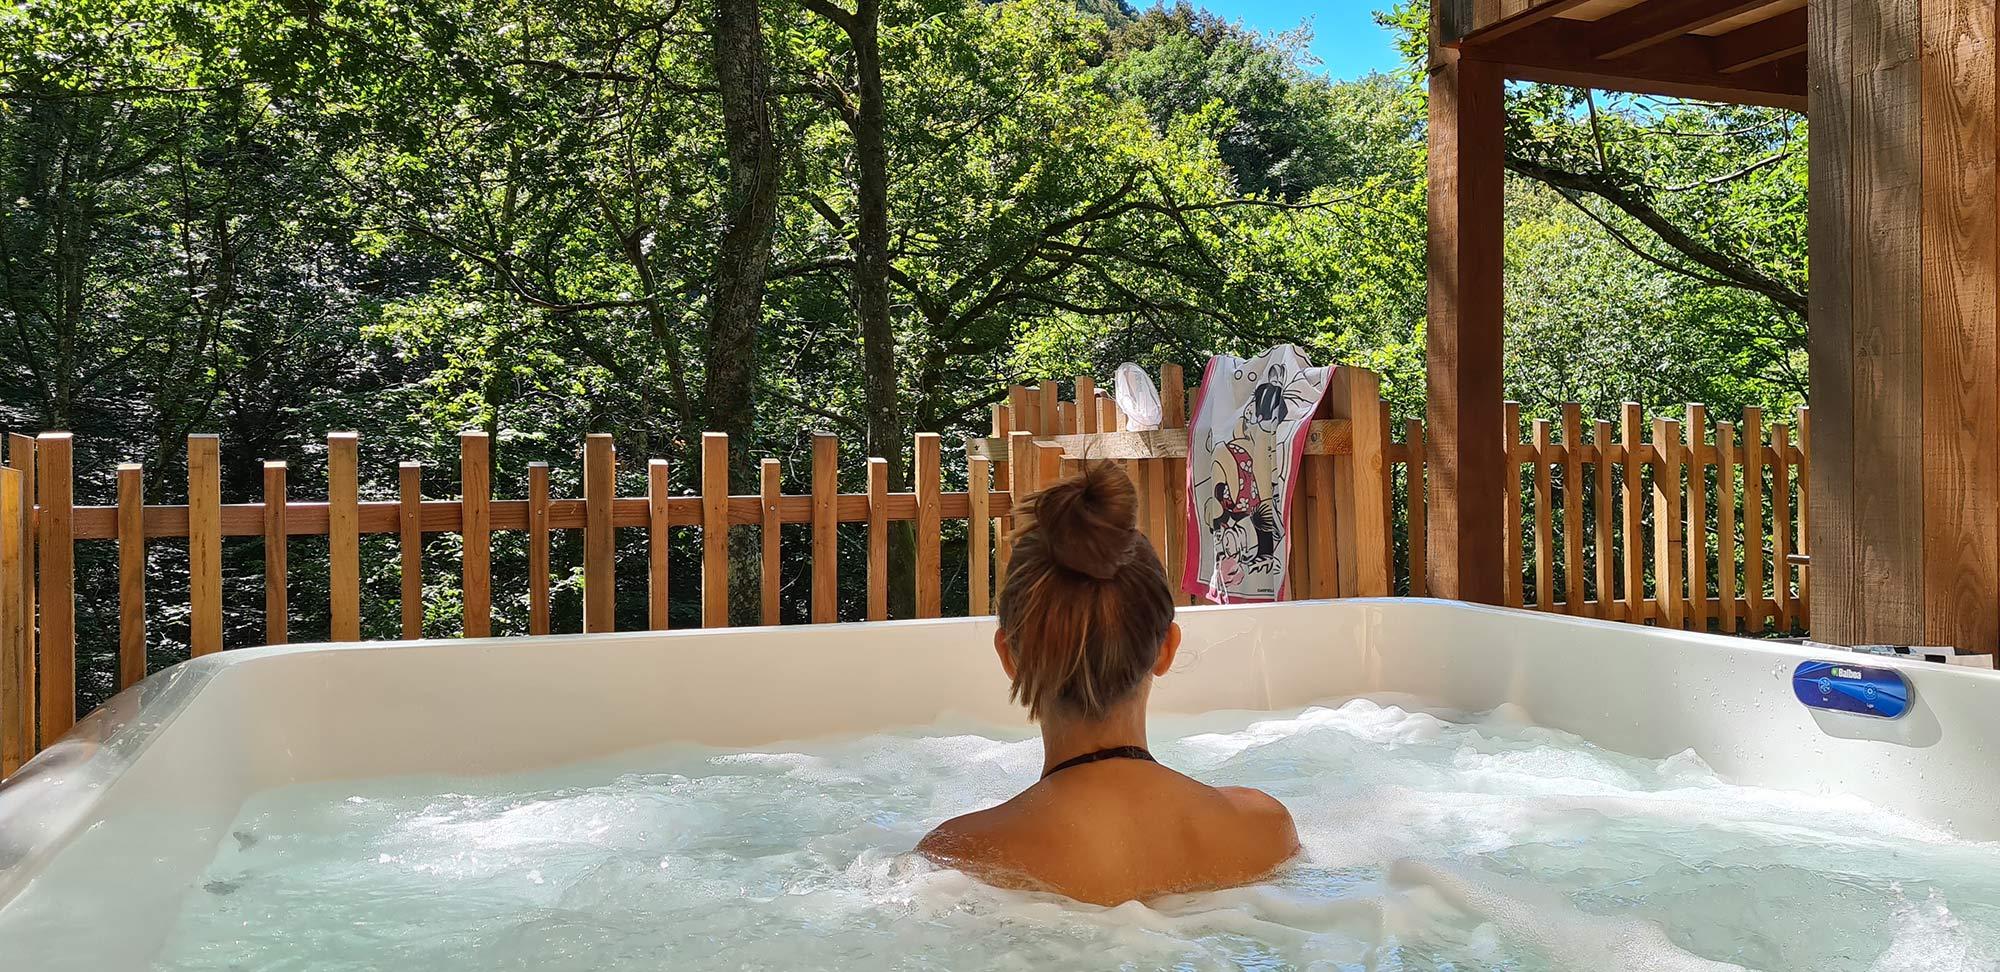 private spa full of nature terrace cabin